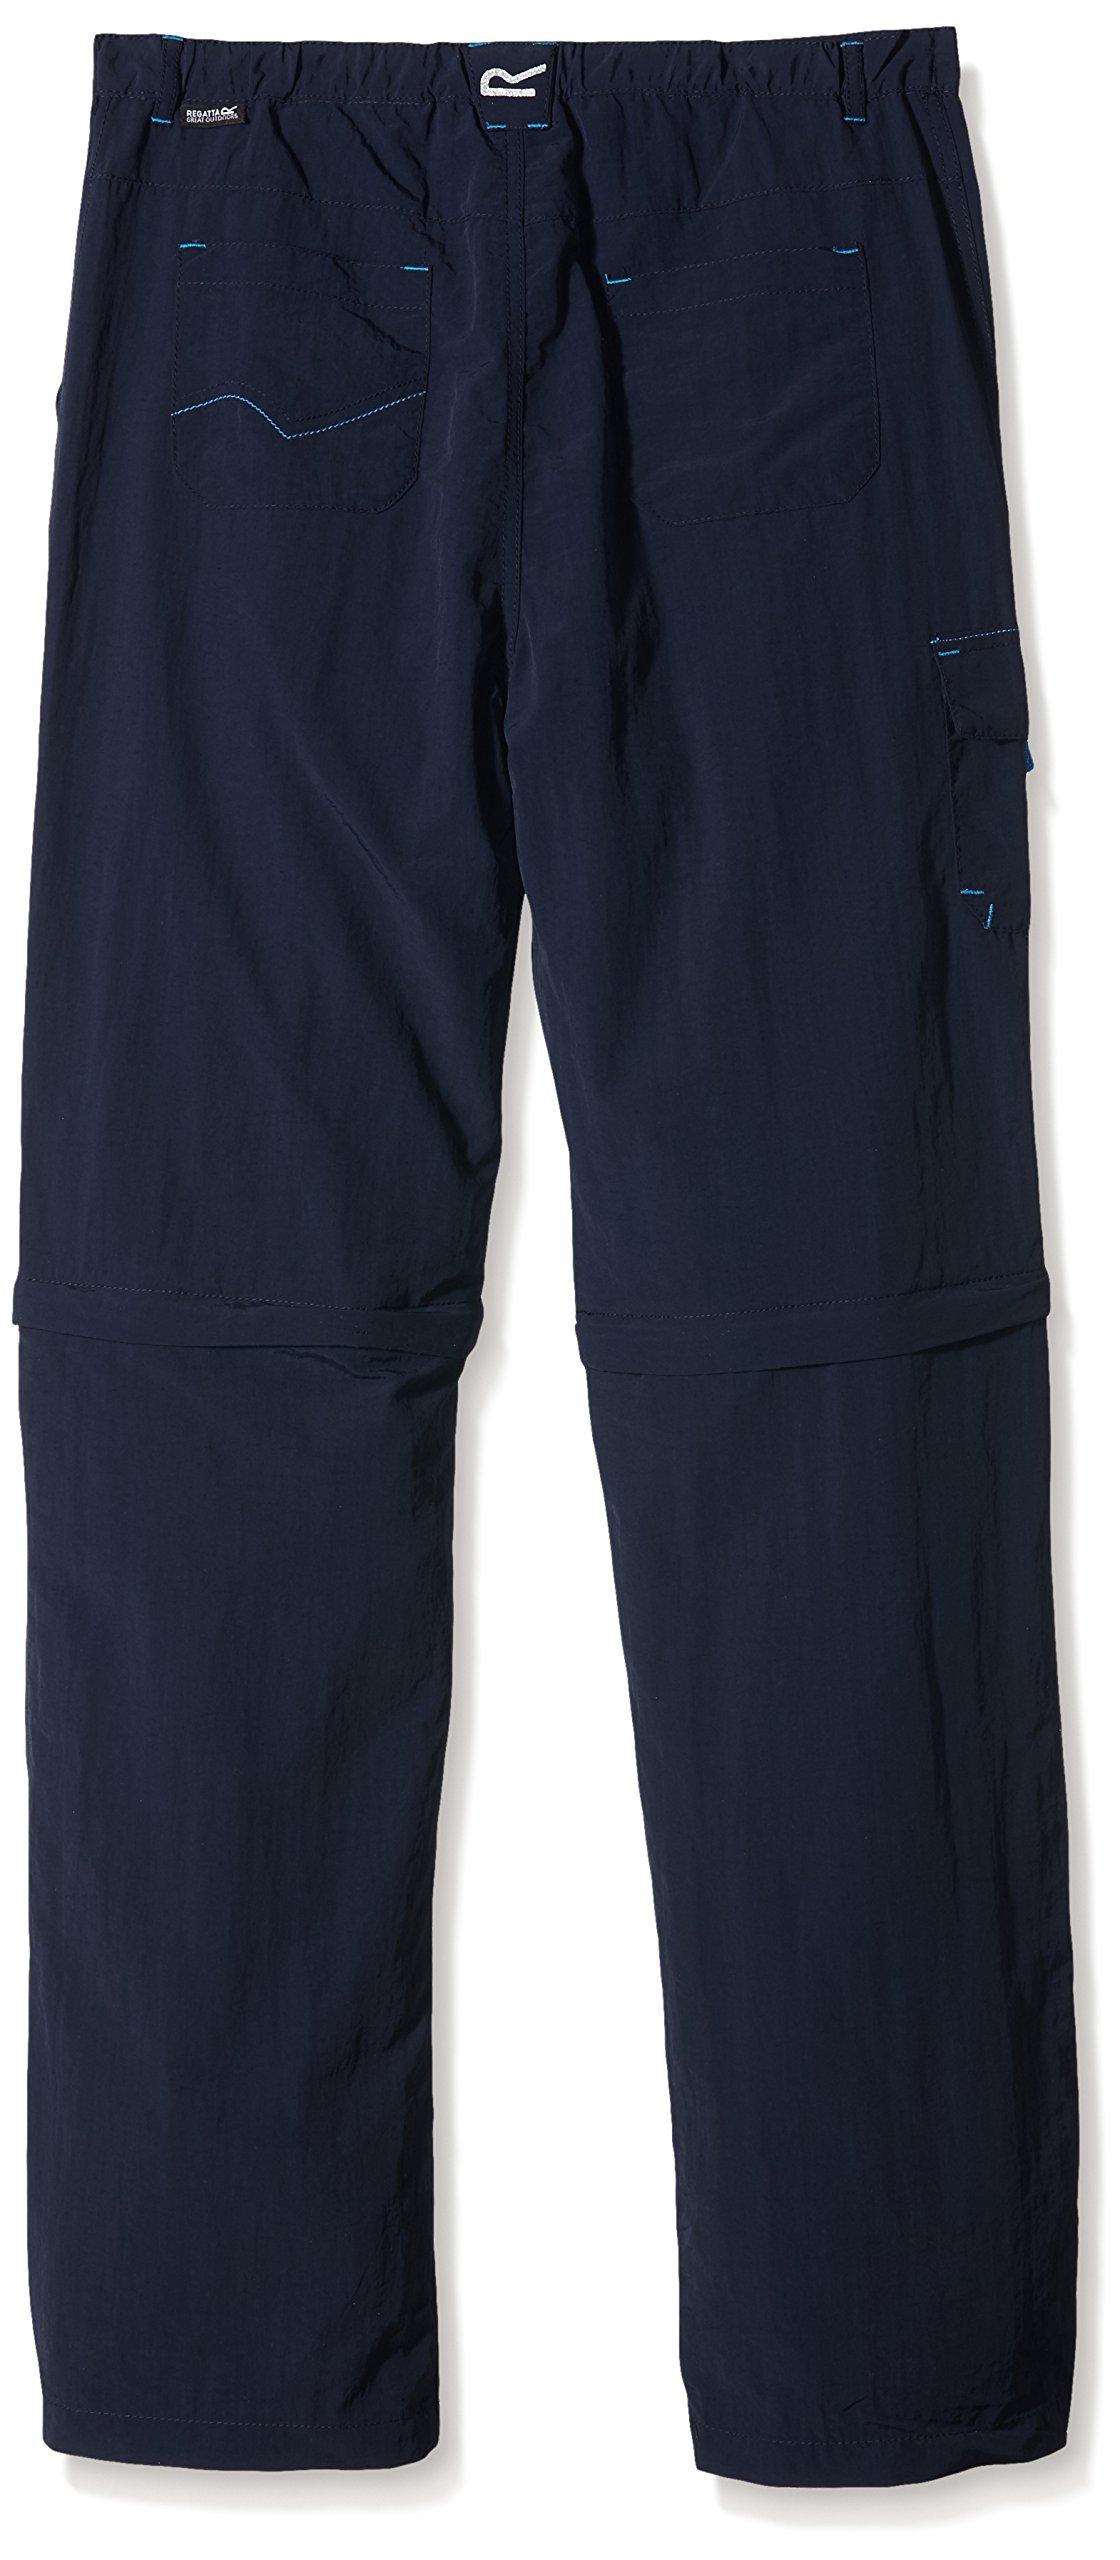 Regatta Kids' Sorcer Zip-Off Trousers 2